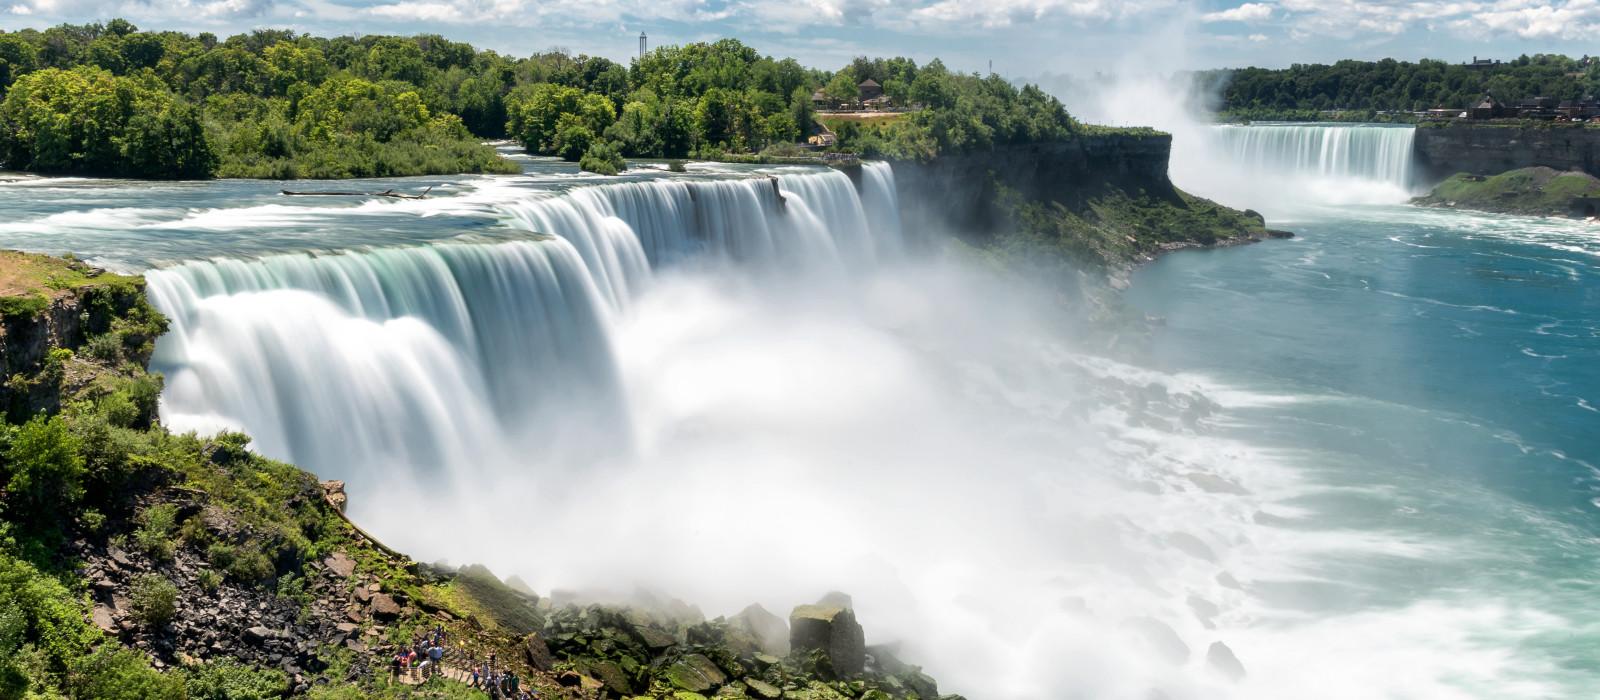 Destination Niagara Falls Canada